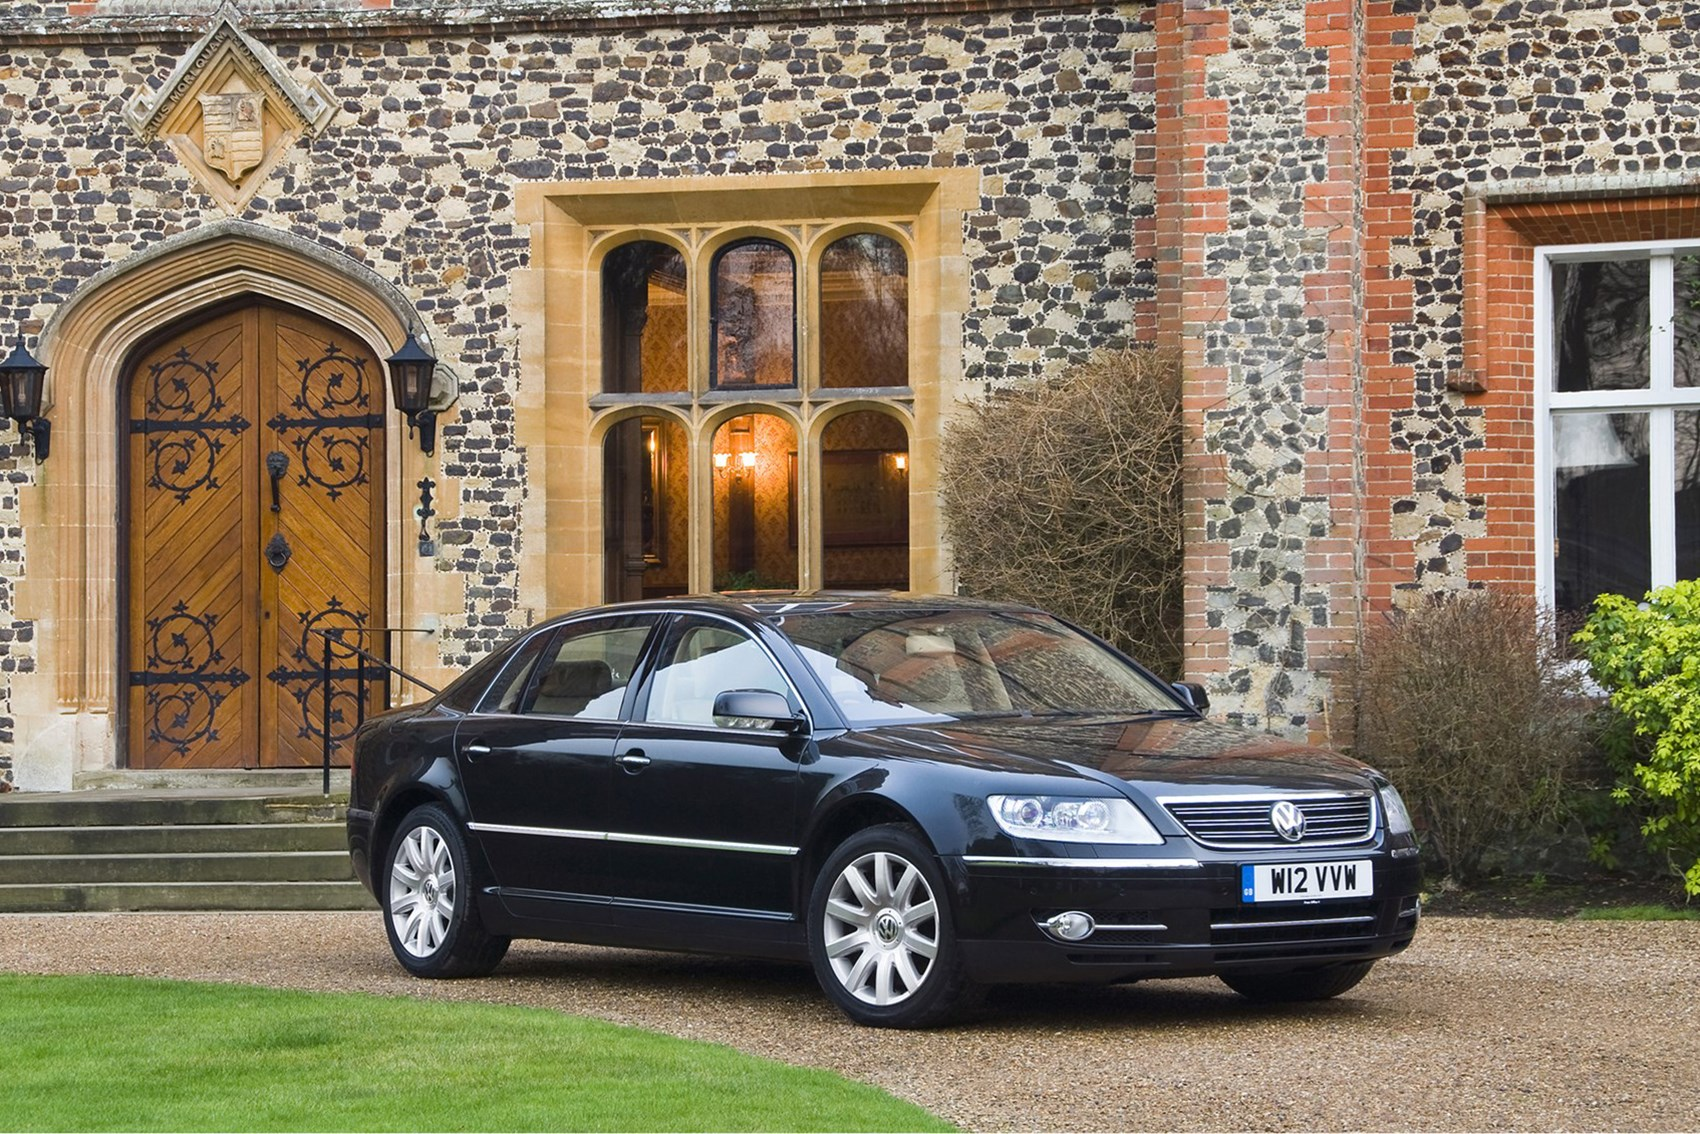 VW Phaeton - luxury cars for less than £10k